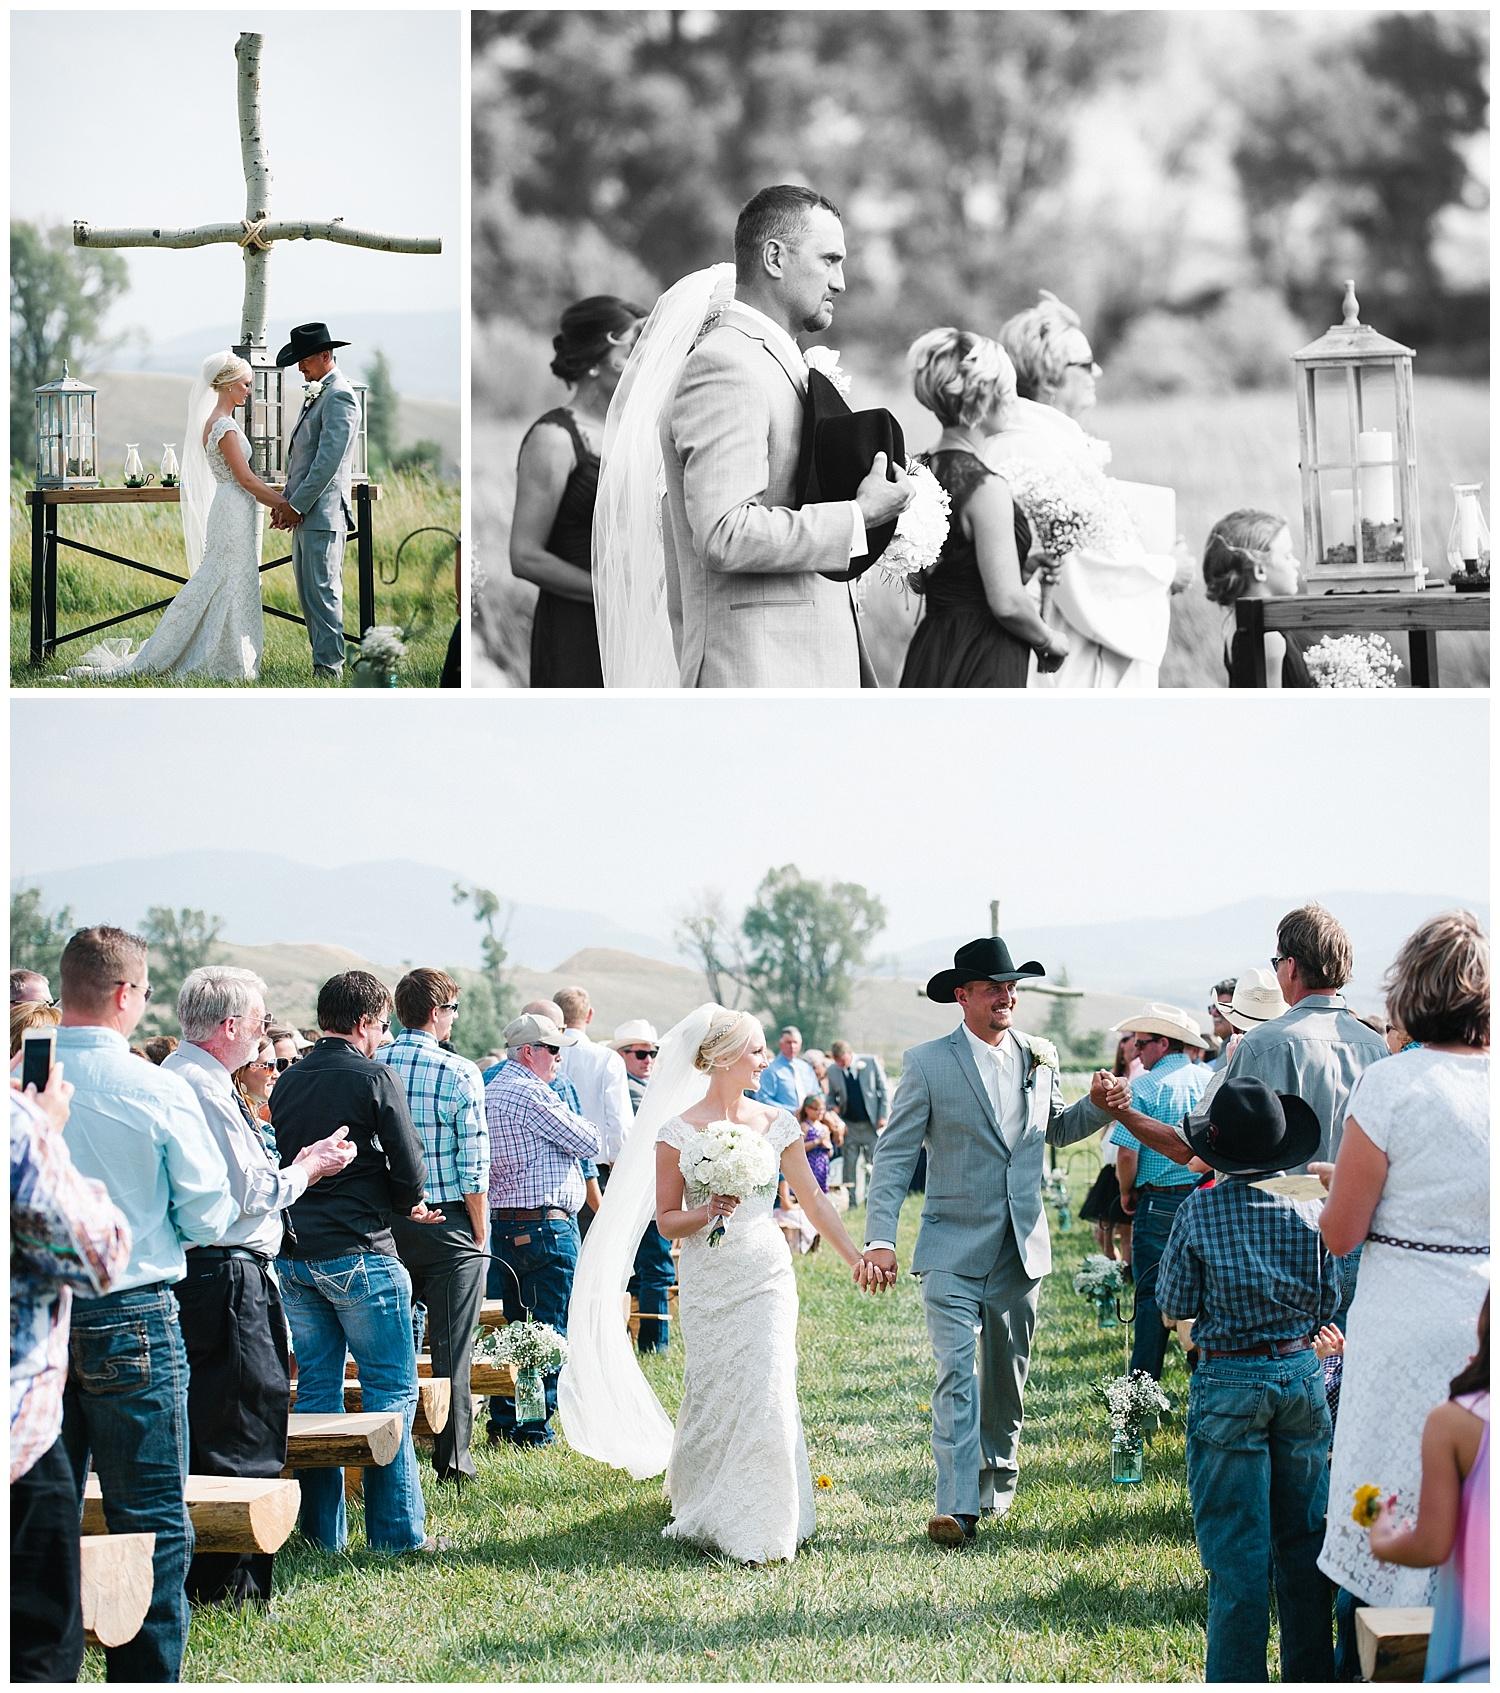 Kremmling CO Ranch Wedding by Caitlin Steuben Photography6.jpg